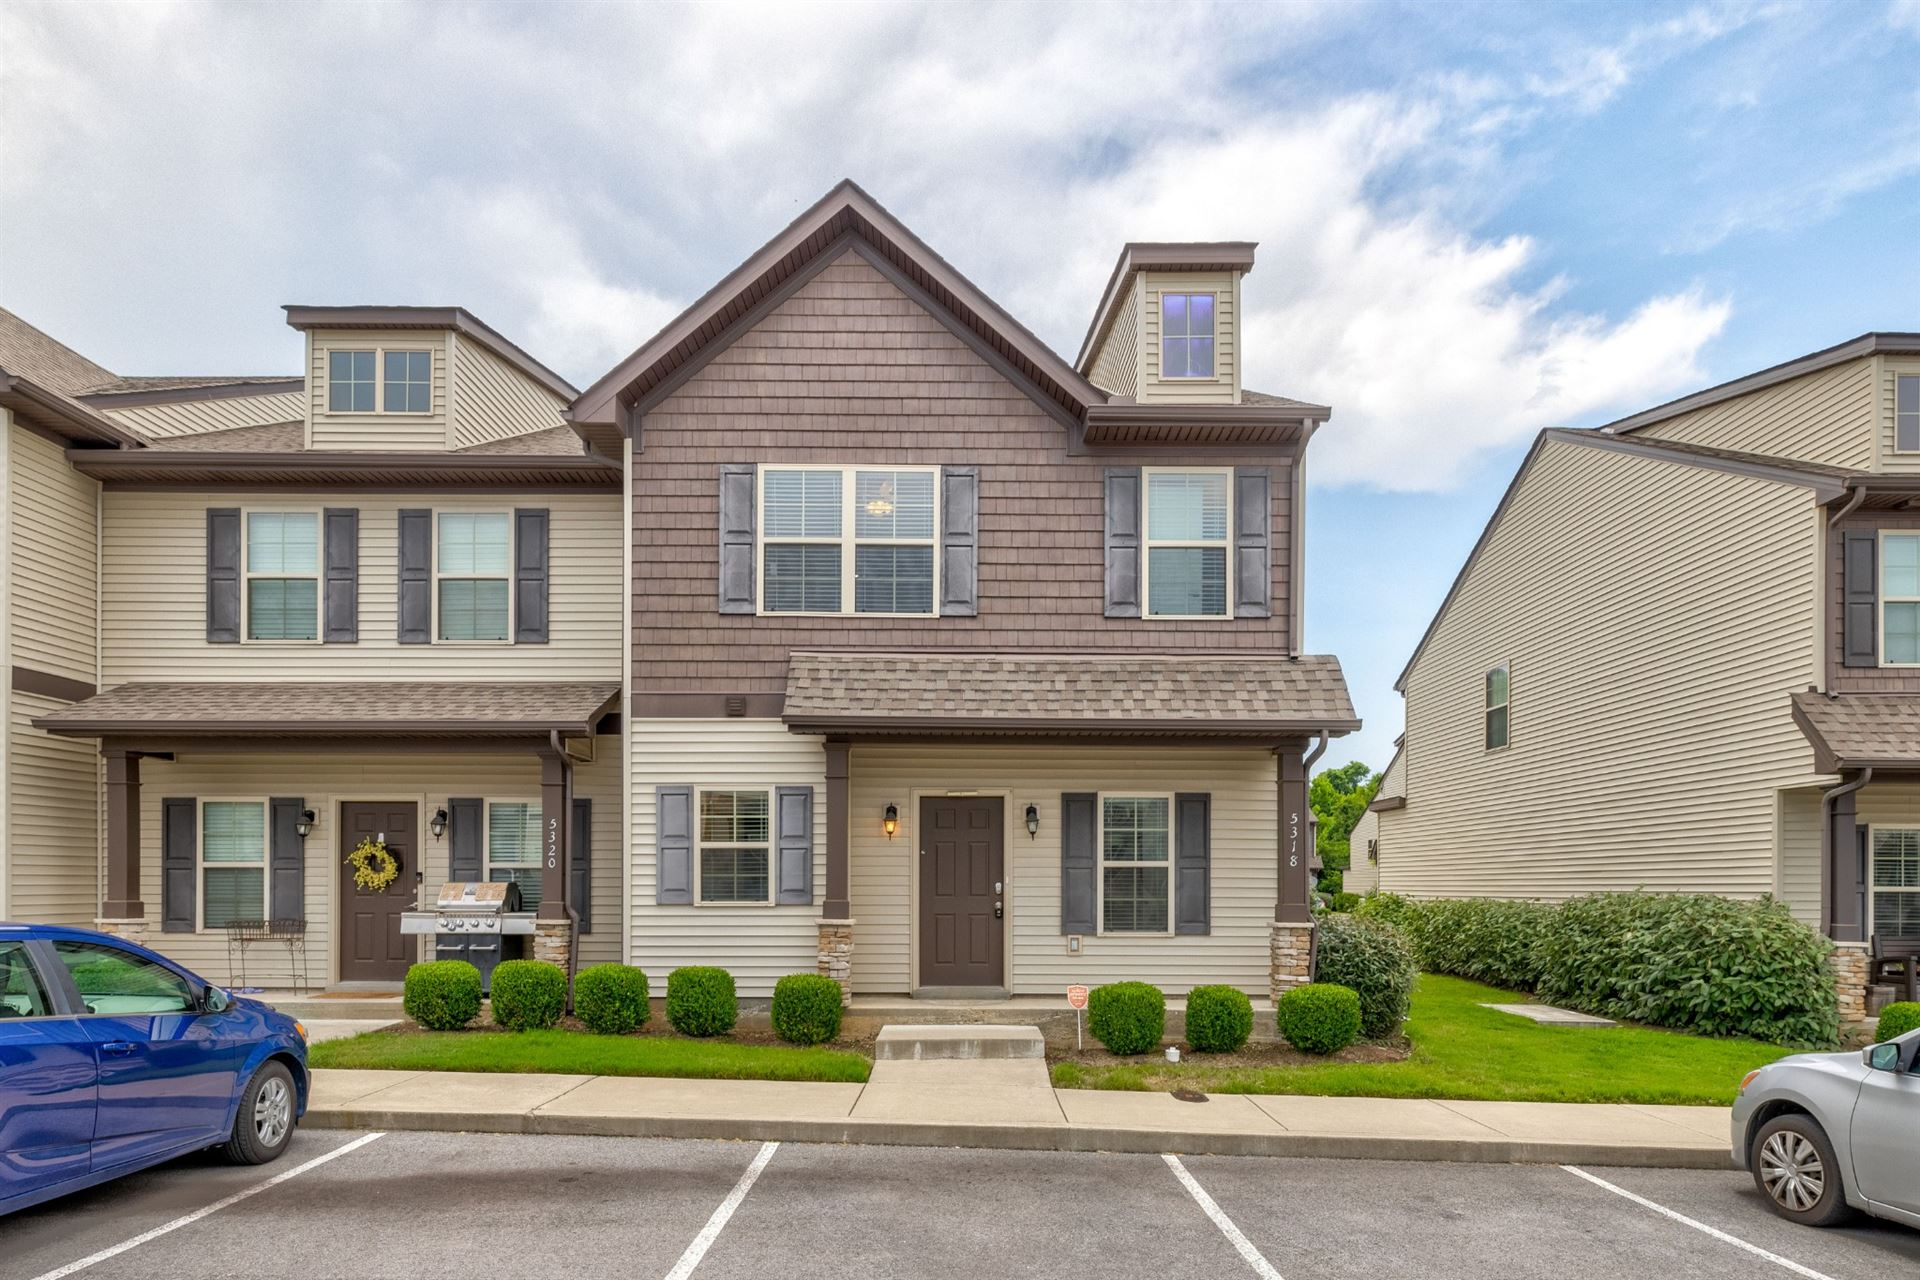 5318 Dan Post Way, Murfreesboro, TN 37128 - MLS#: 2270893